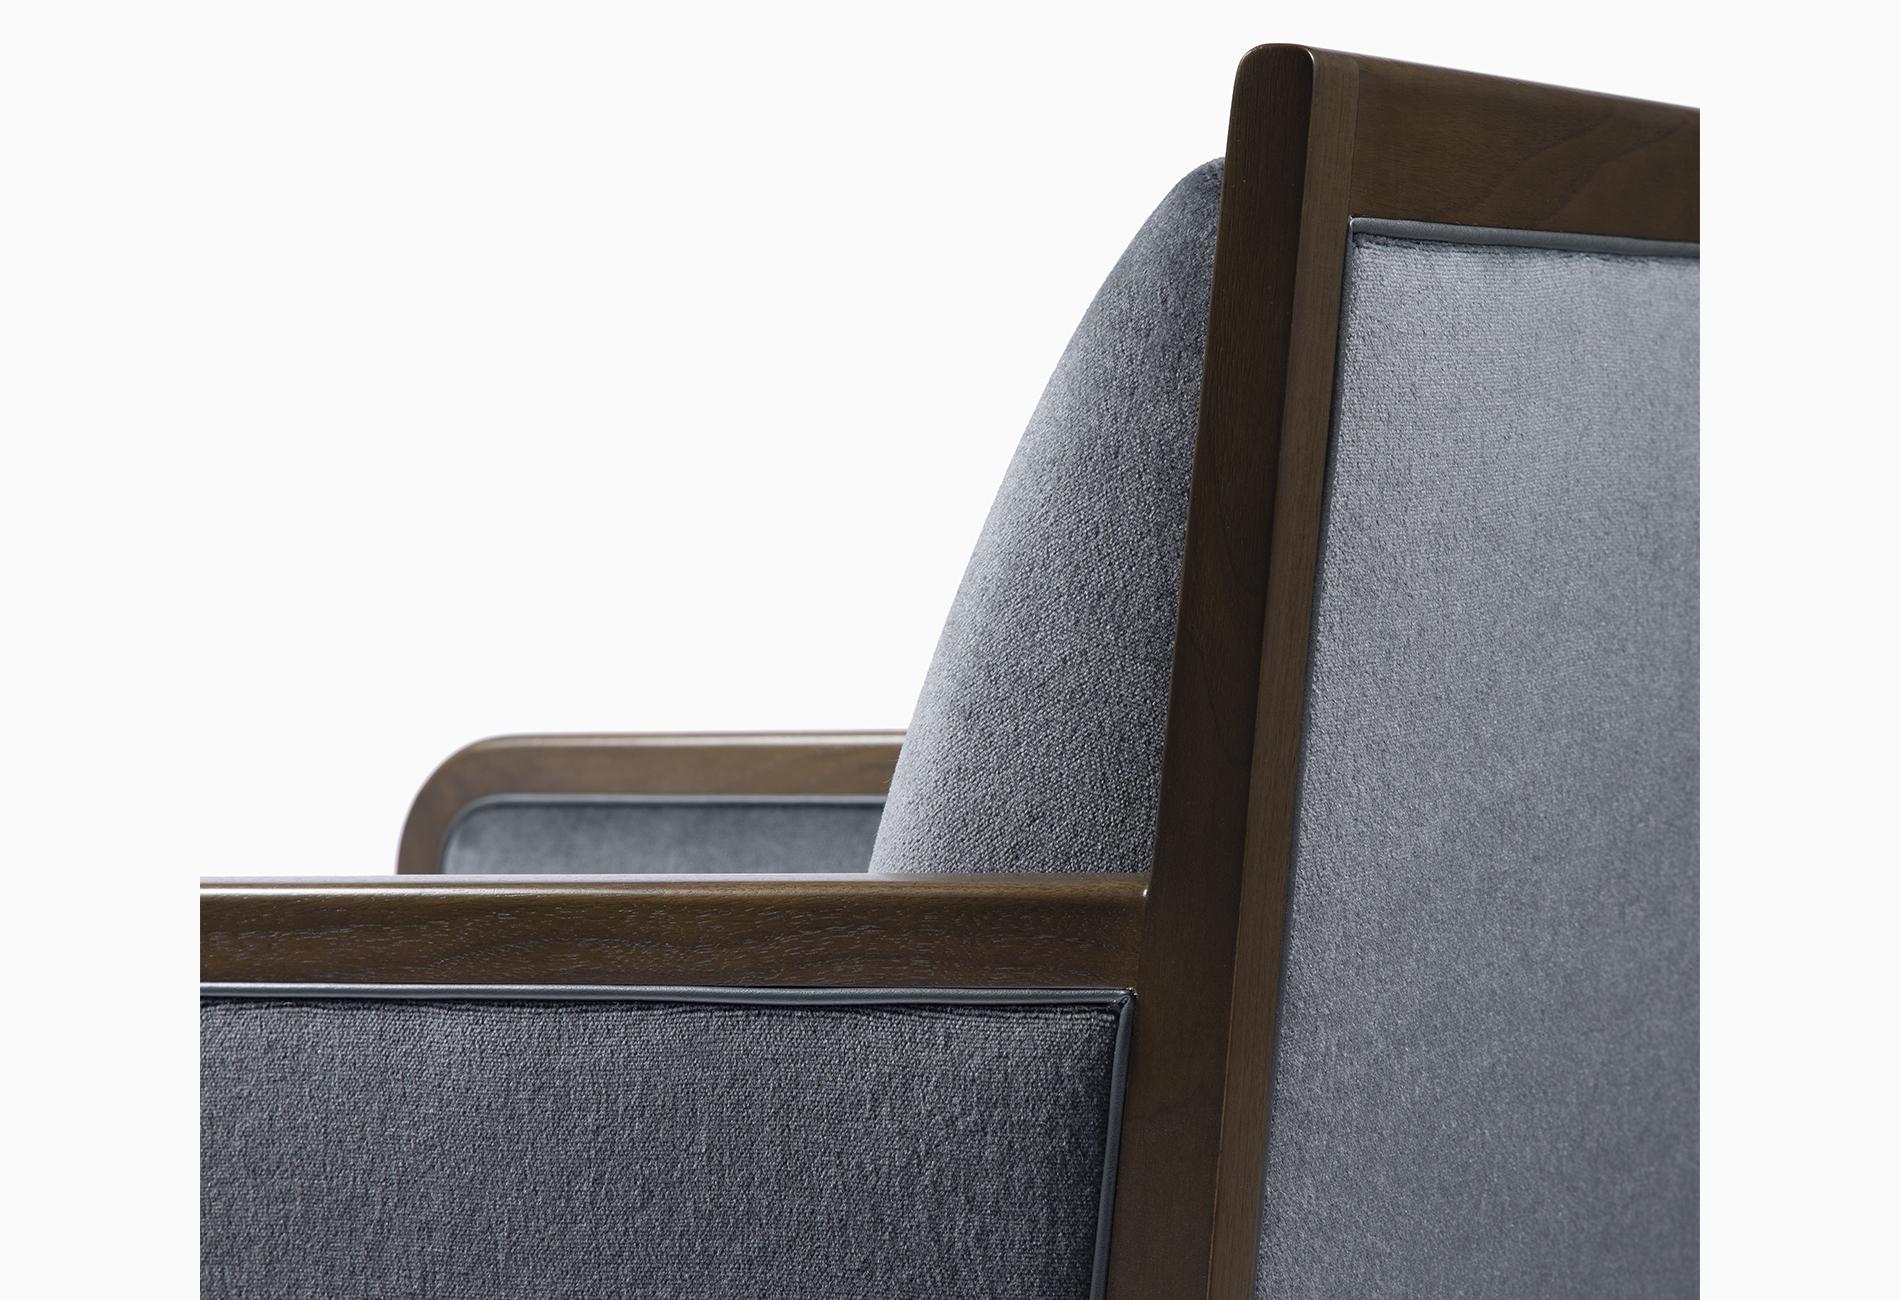 CMS Triumph Lounge Chair (4)_Revised.jpg